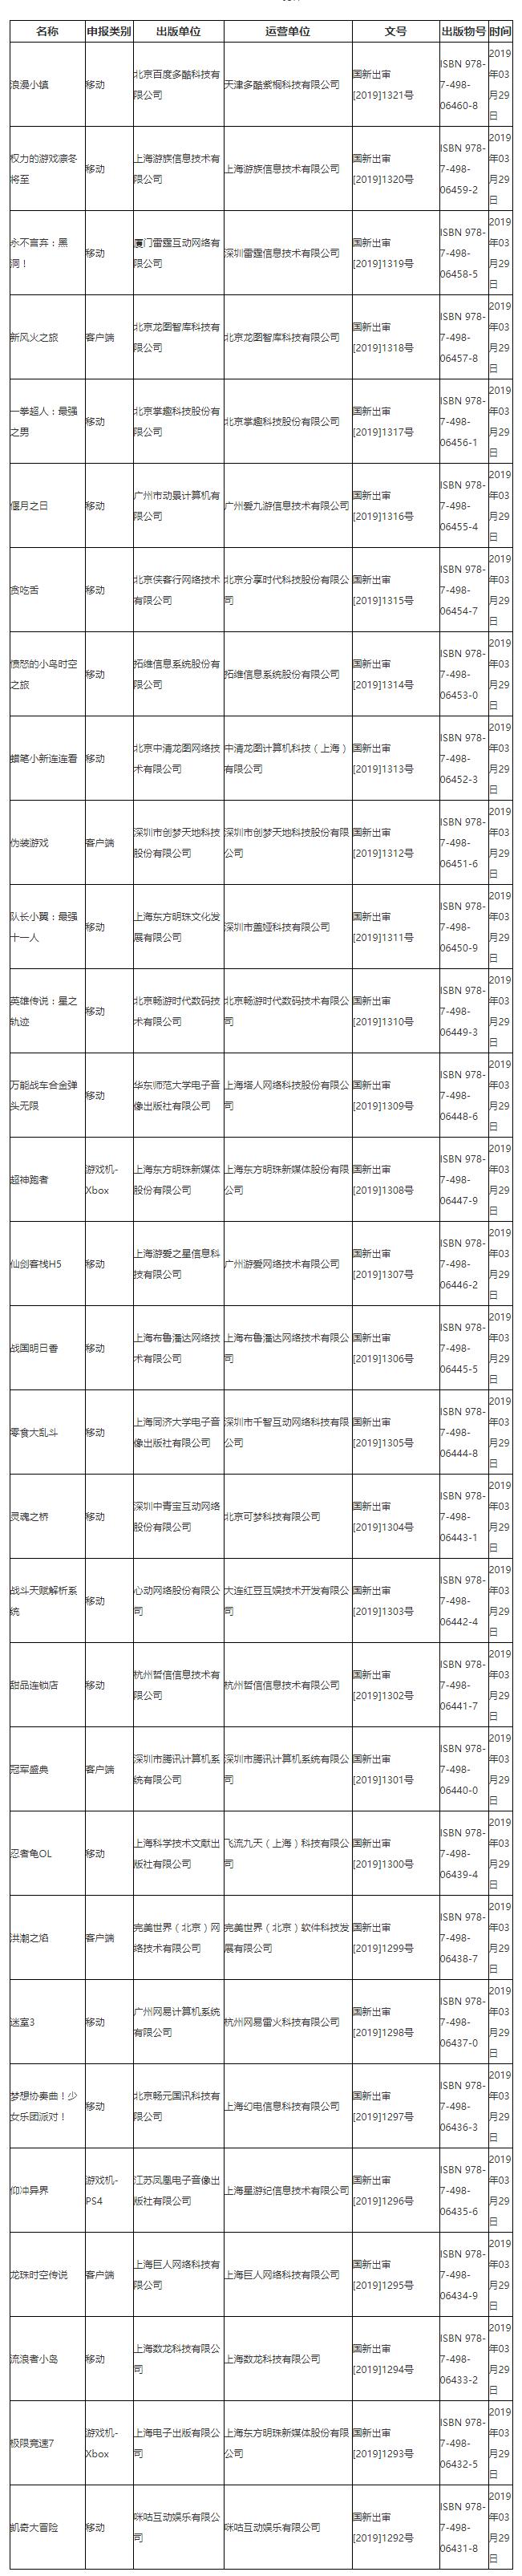 Opera 快照_2019-04-02_165247_www.sapprft.gov.cn.png